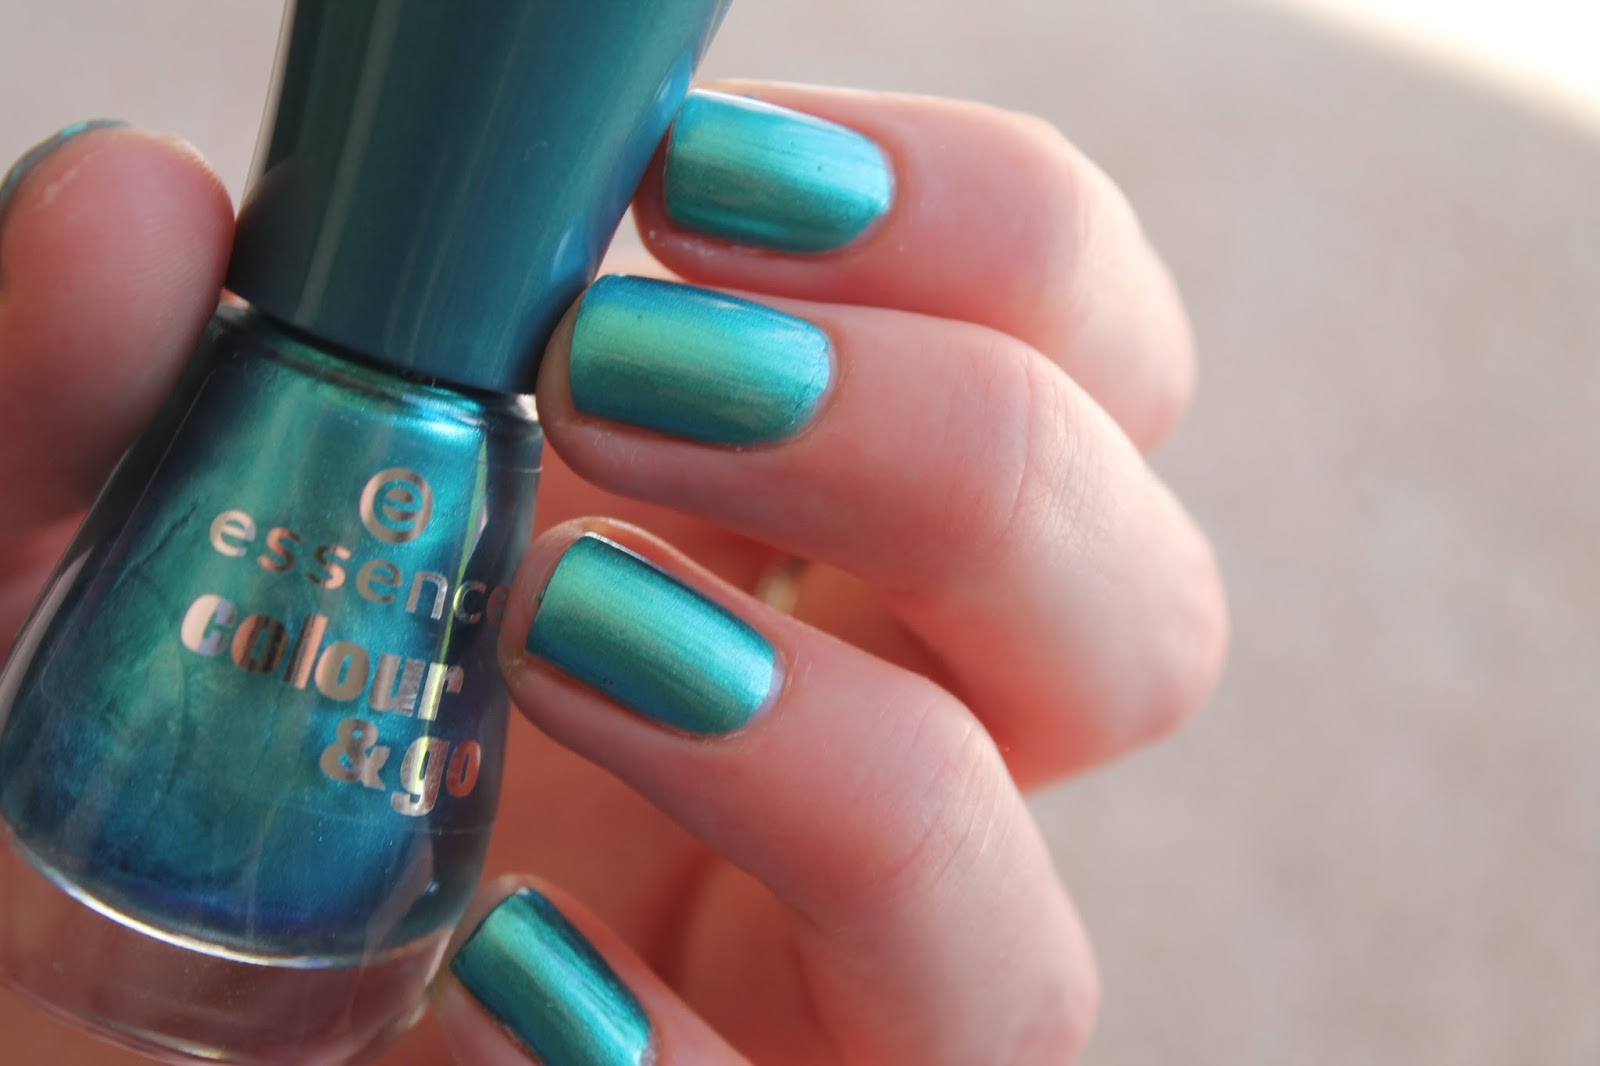 essence colour and go nail polish - 172 splash swatch